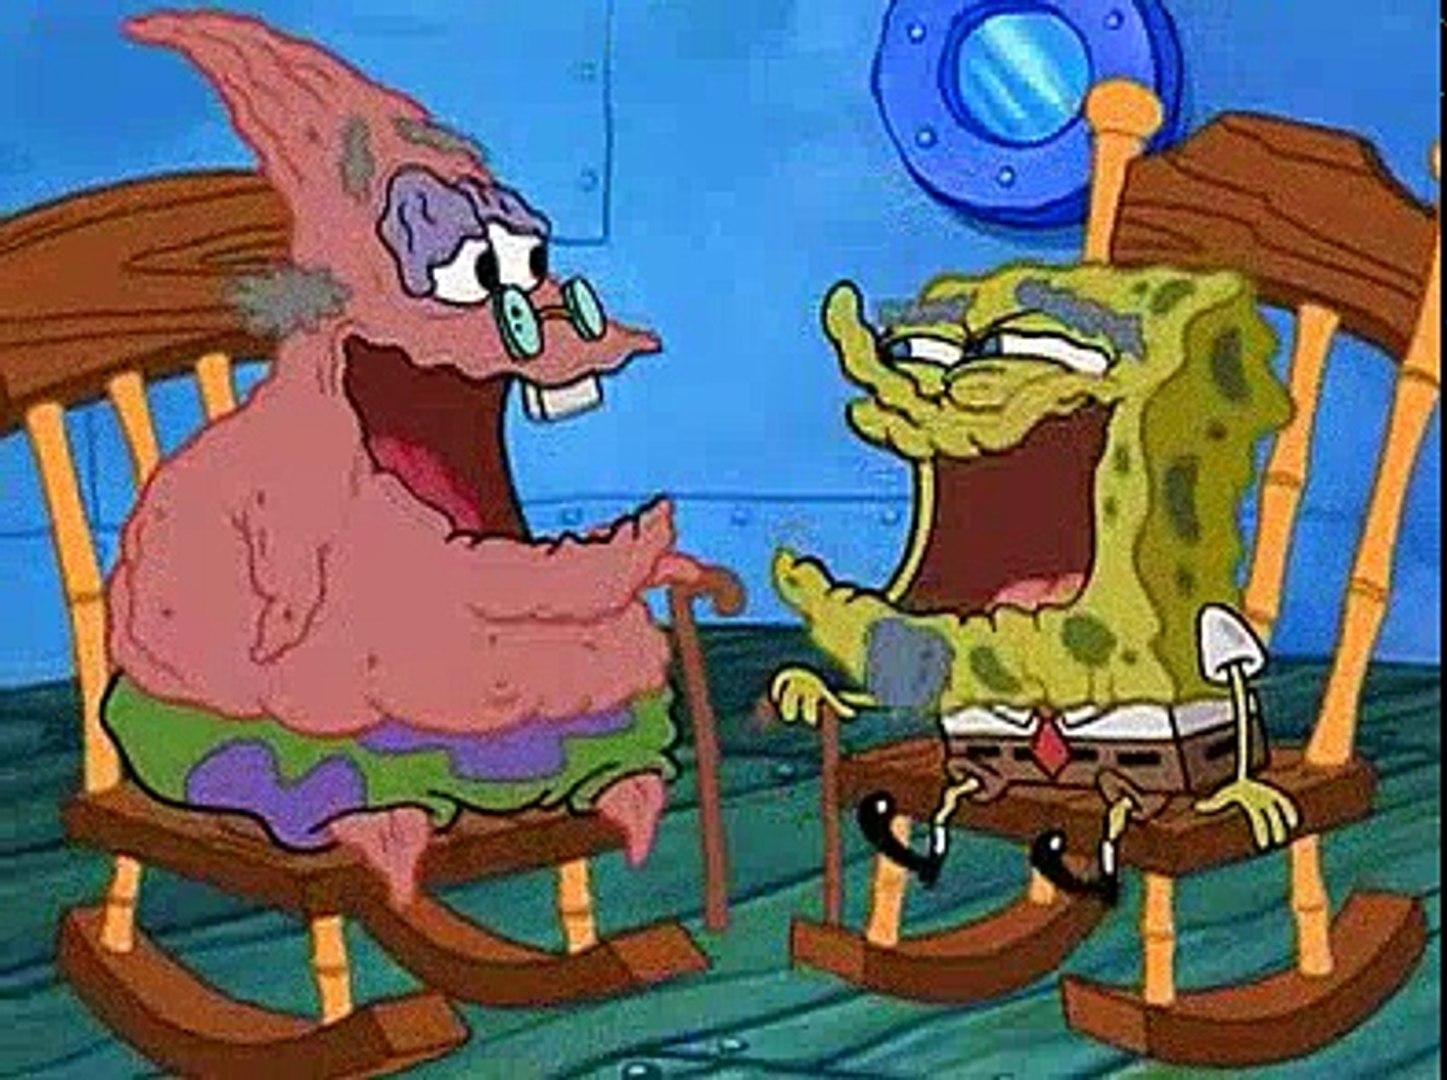 Spongebob Squarepants 228 The Secret Box